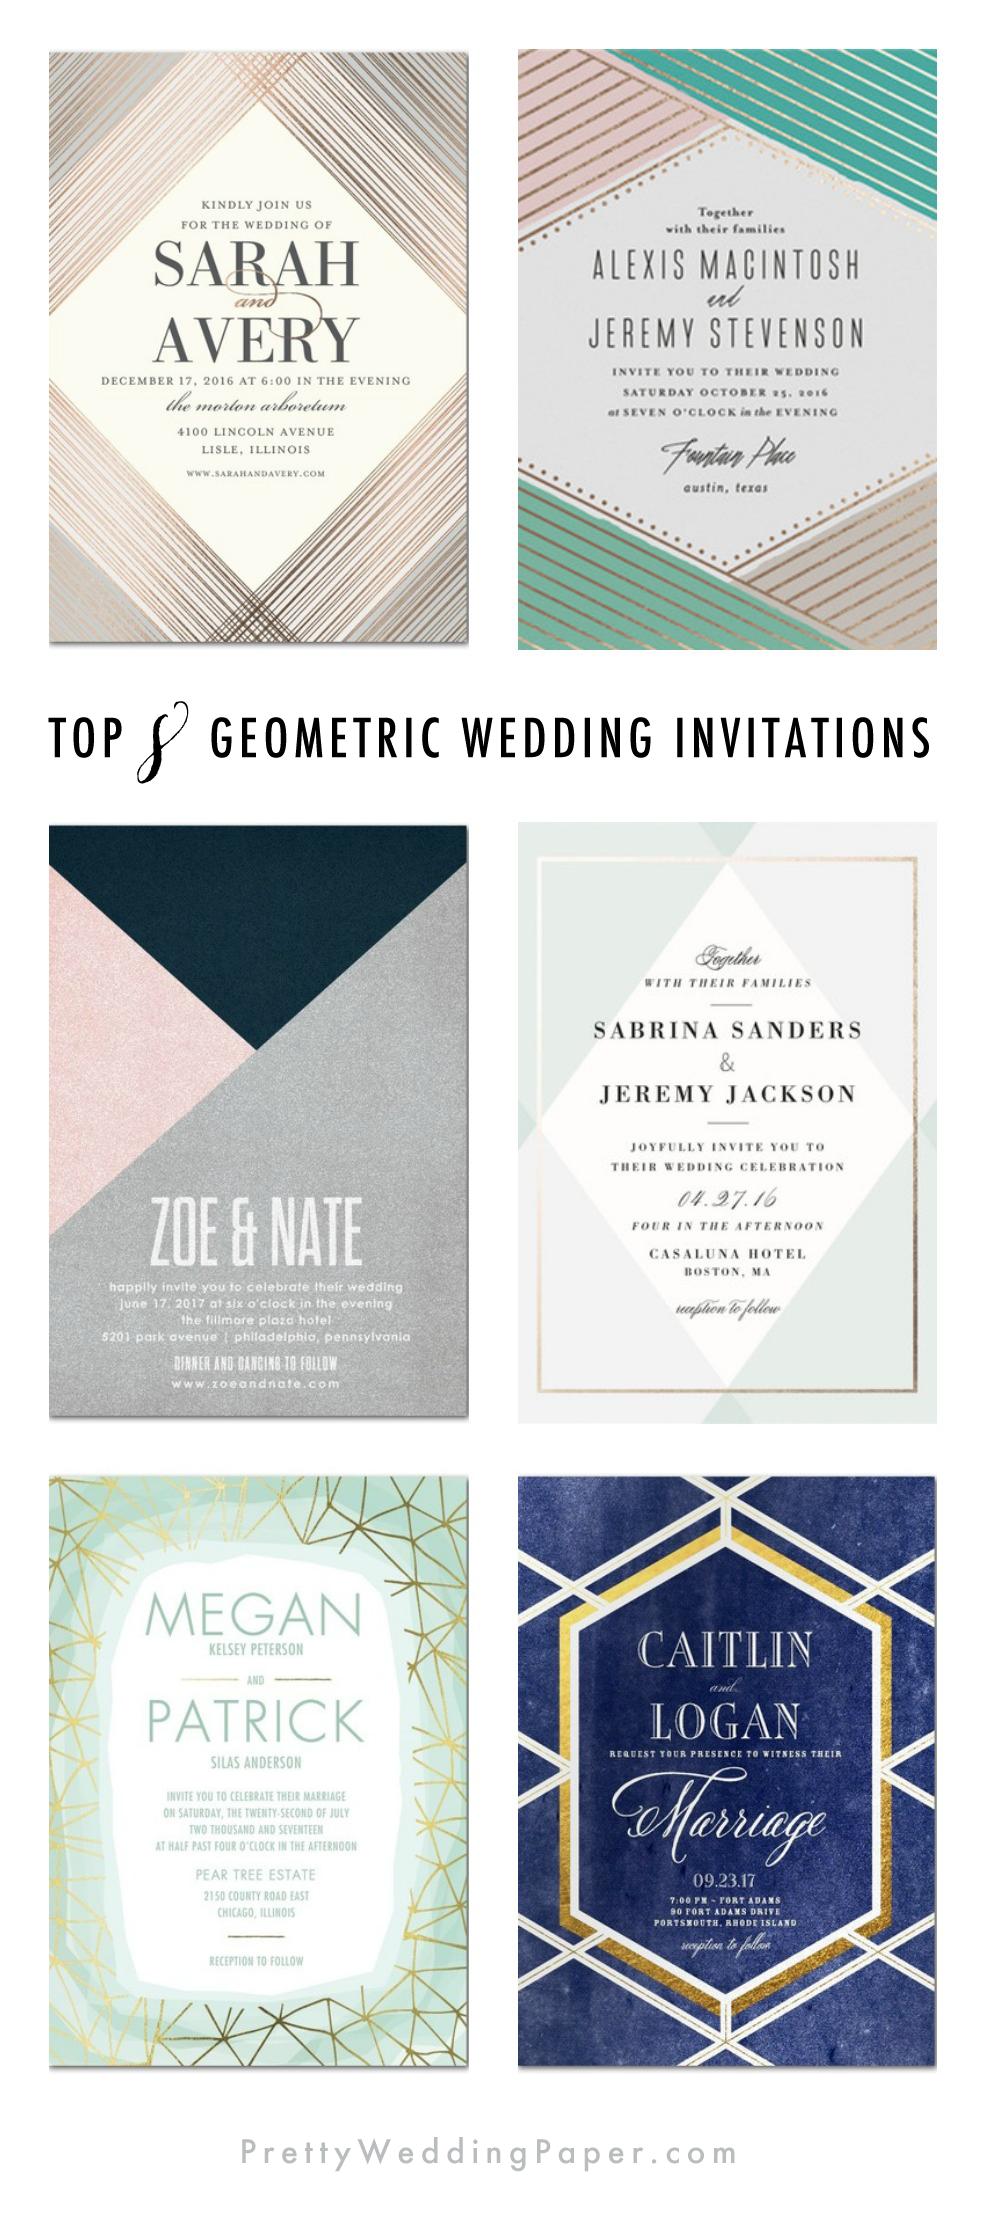 Top Eight Geometric Wedding Invitations. ♥ picked by prettyweddingpaper.com